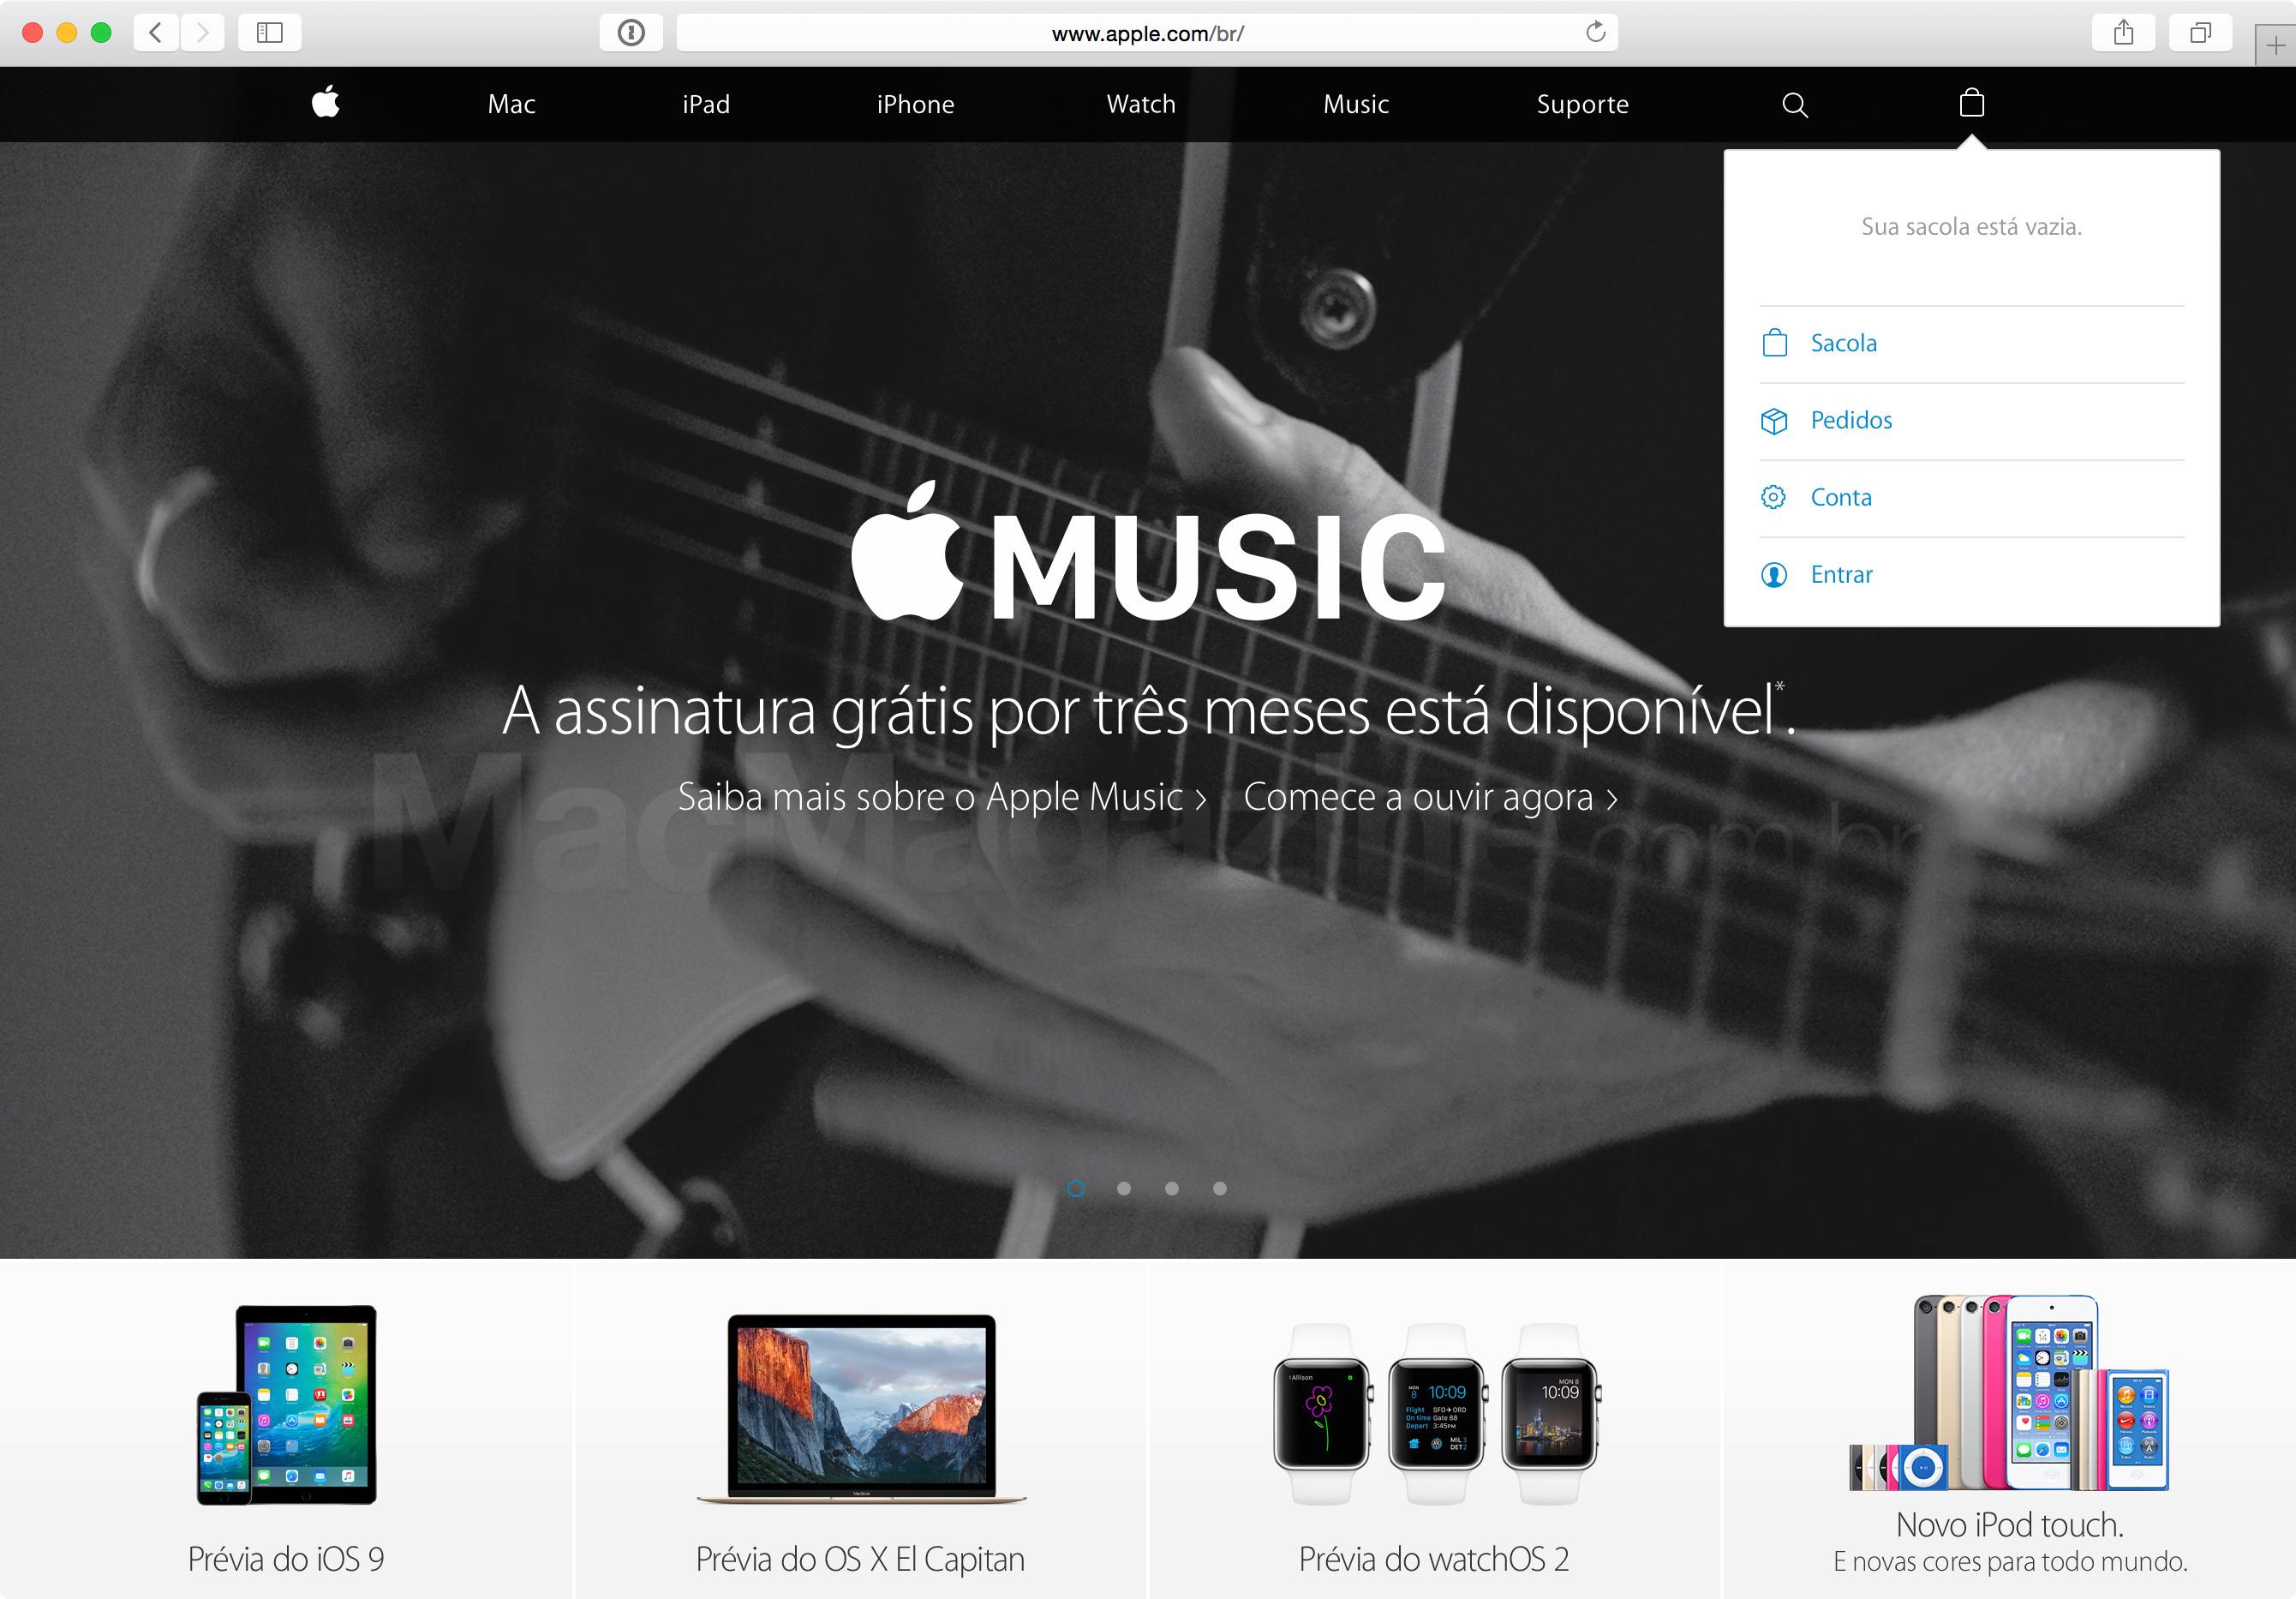 Apple integrated store website